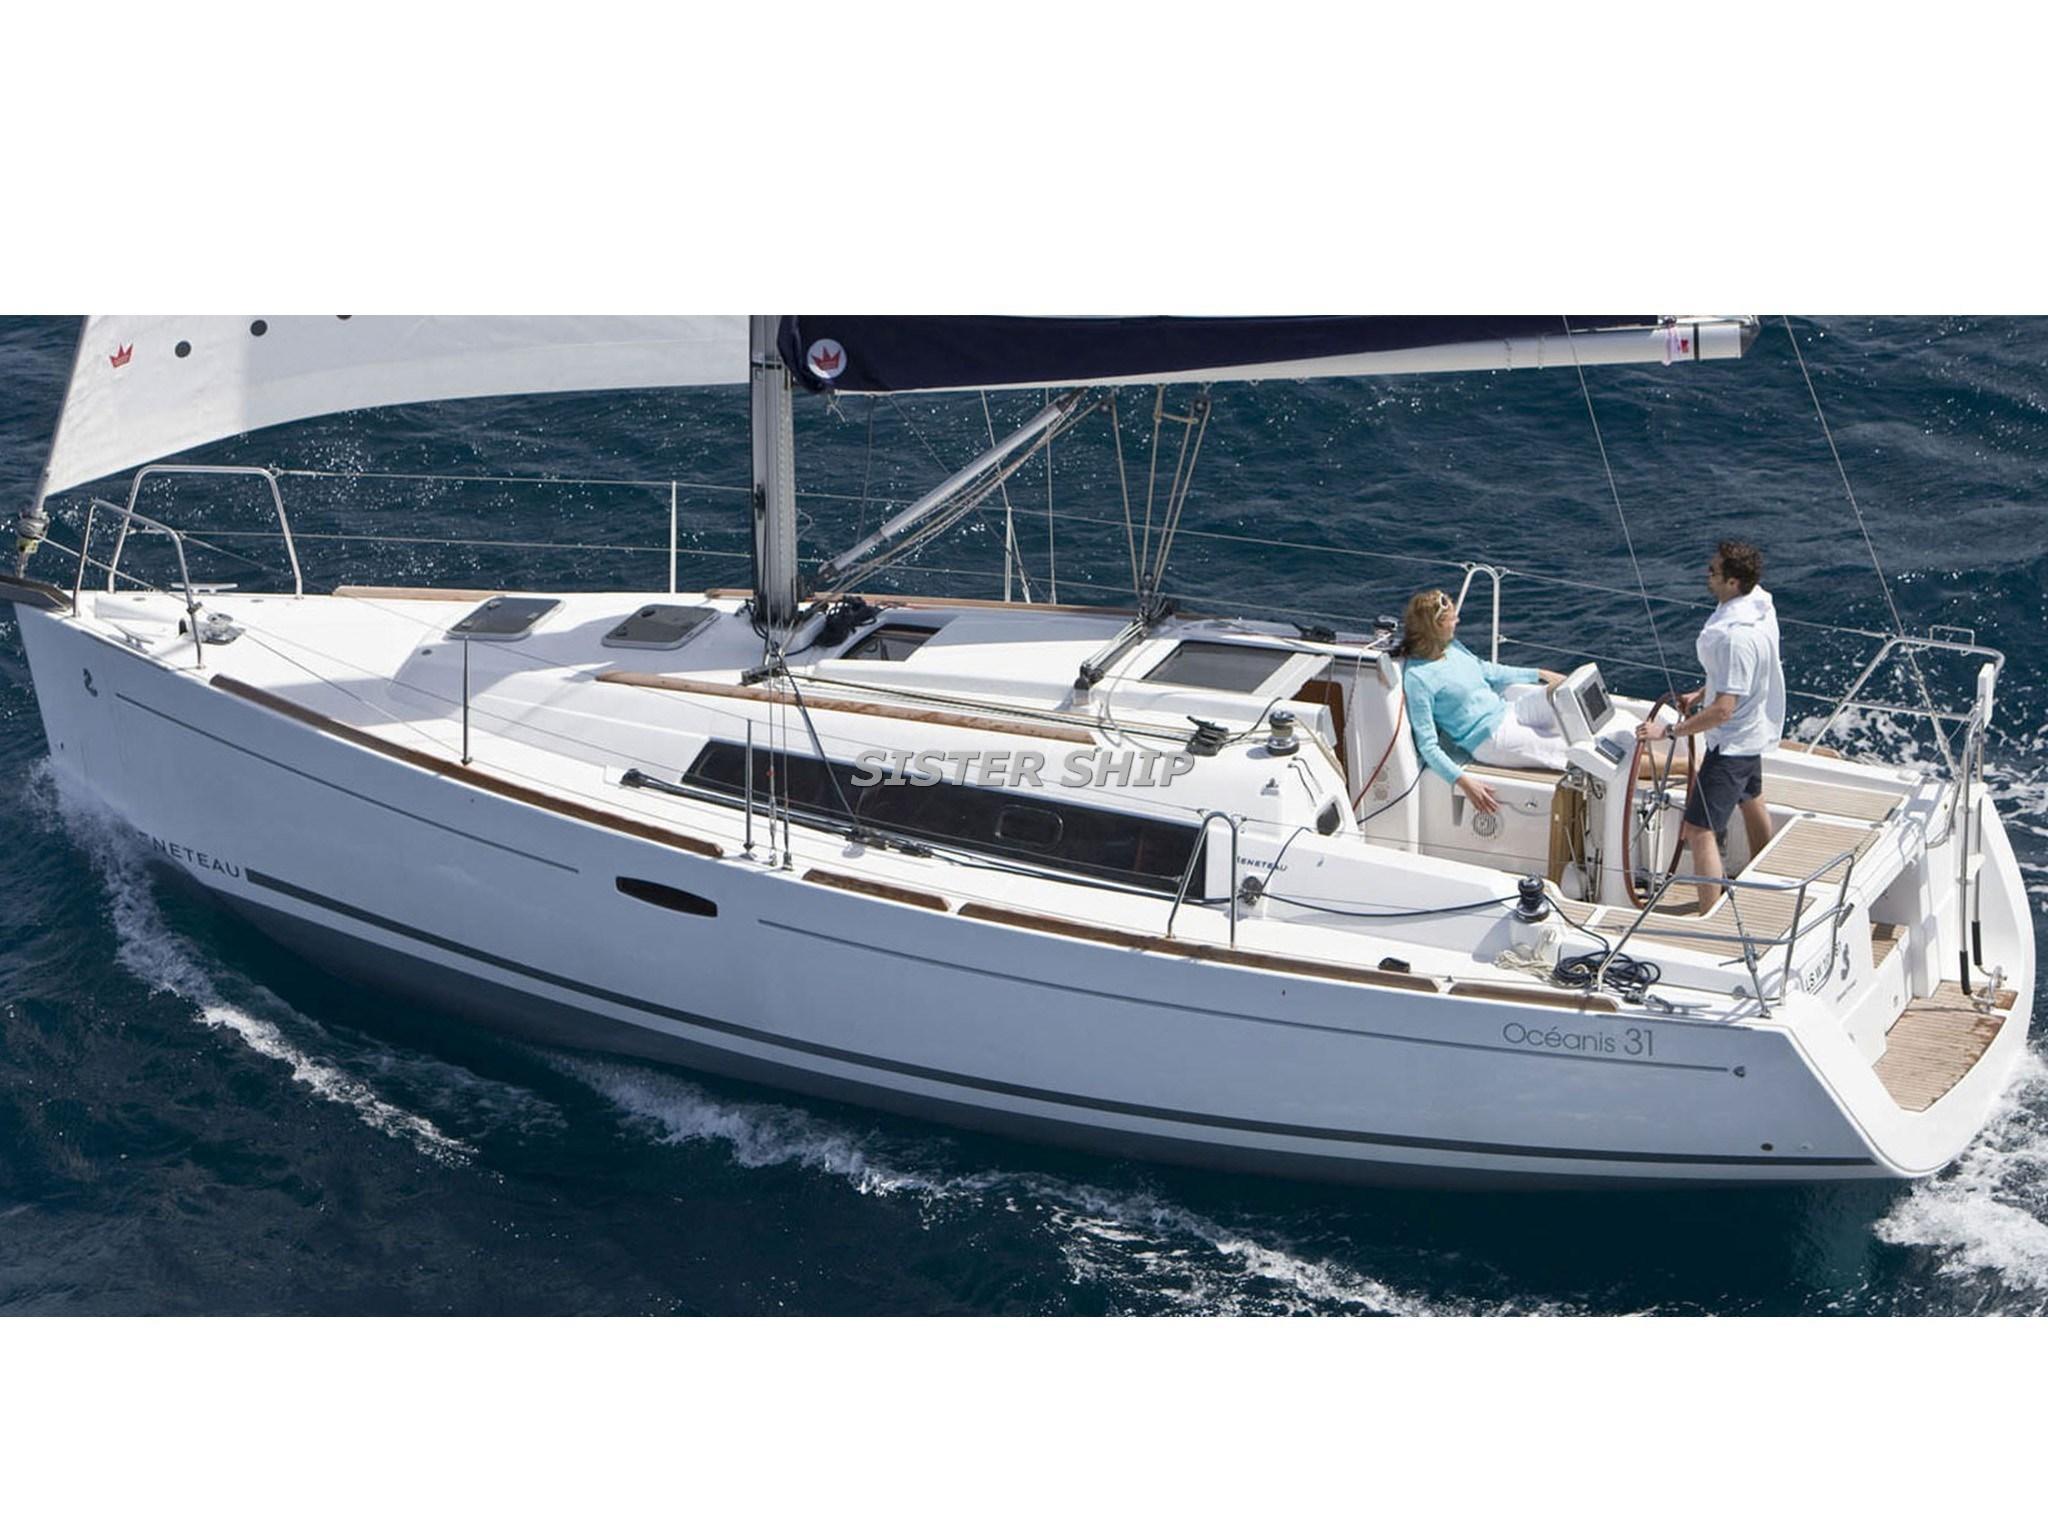 New arrival Beneteau Oceanis 31